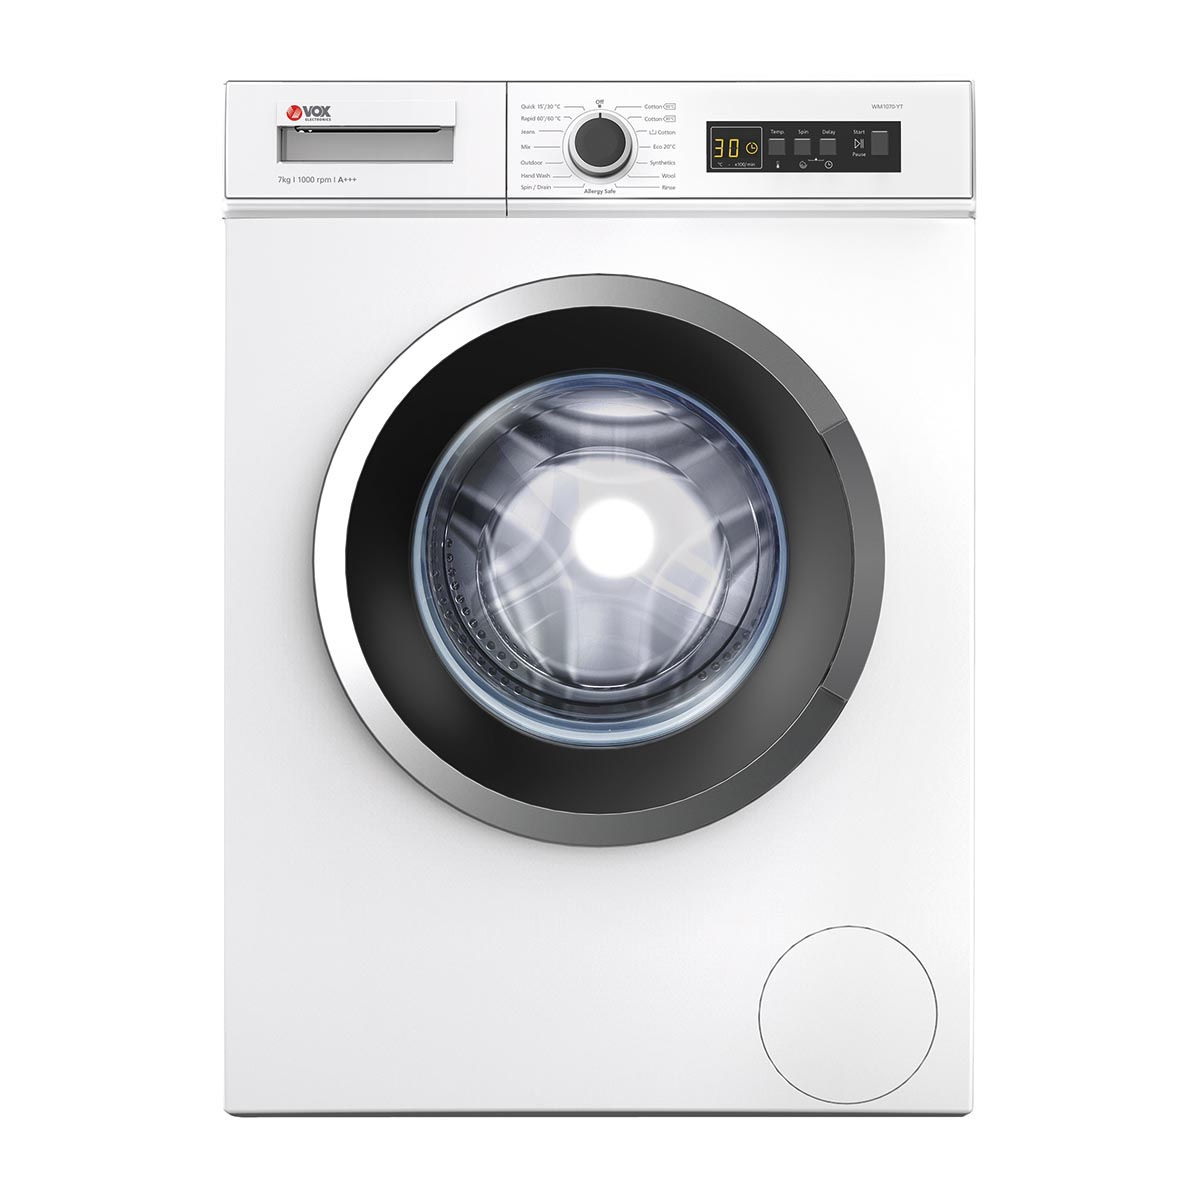 VOX Mašina za pranje veša WM 1075 YTQ - Cool Shop